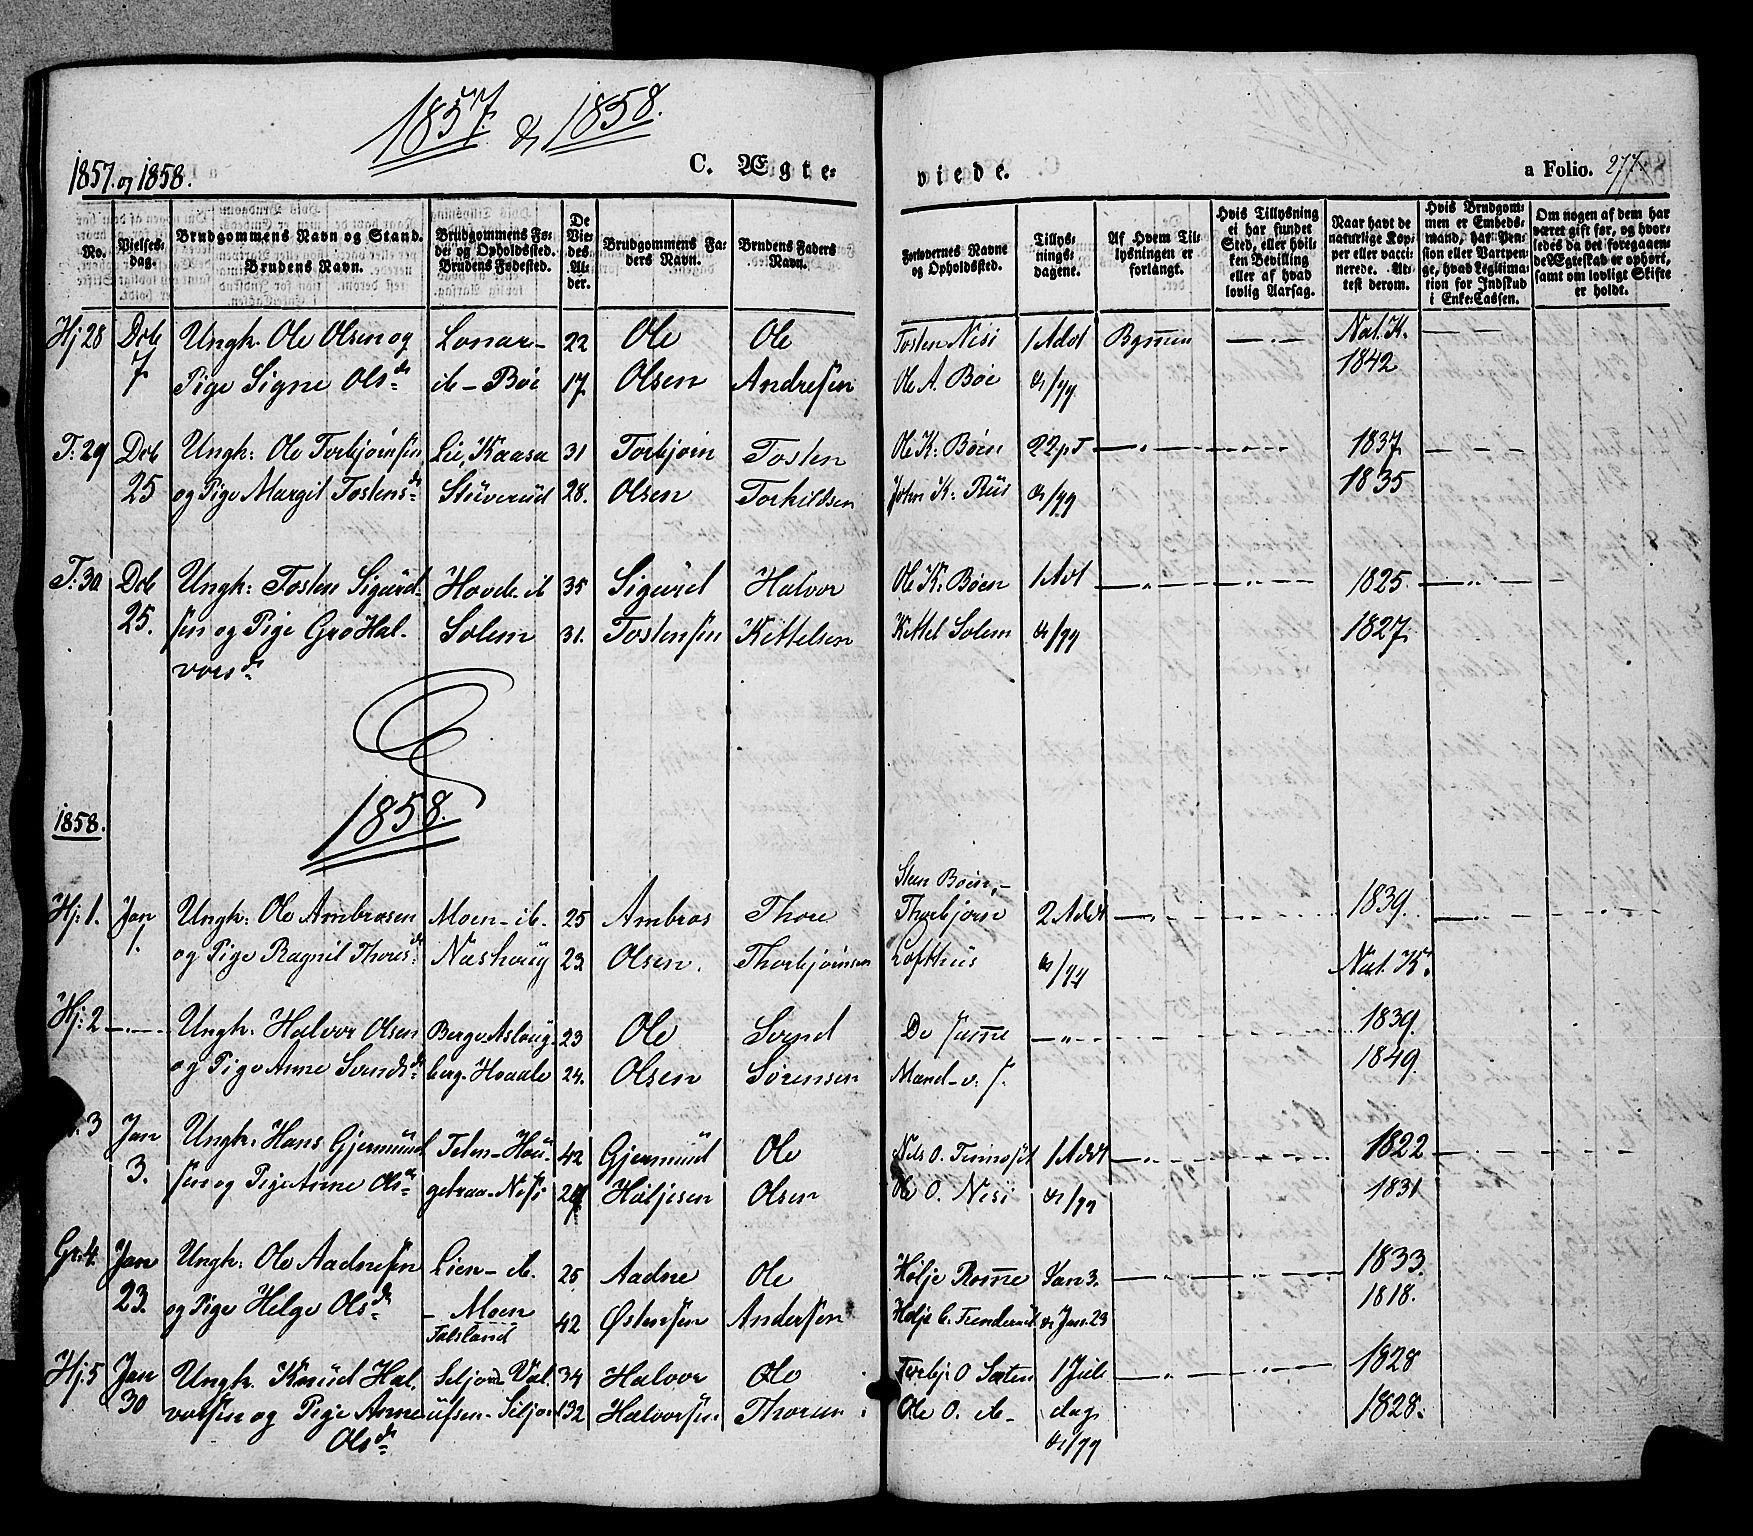 SAKO, Hjartdal kirkebøker, F/Fa/L0008: Ministerialbok nr. I 8, 1844-1859, s. 277